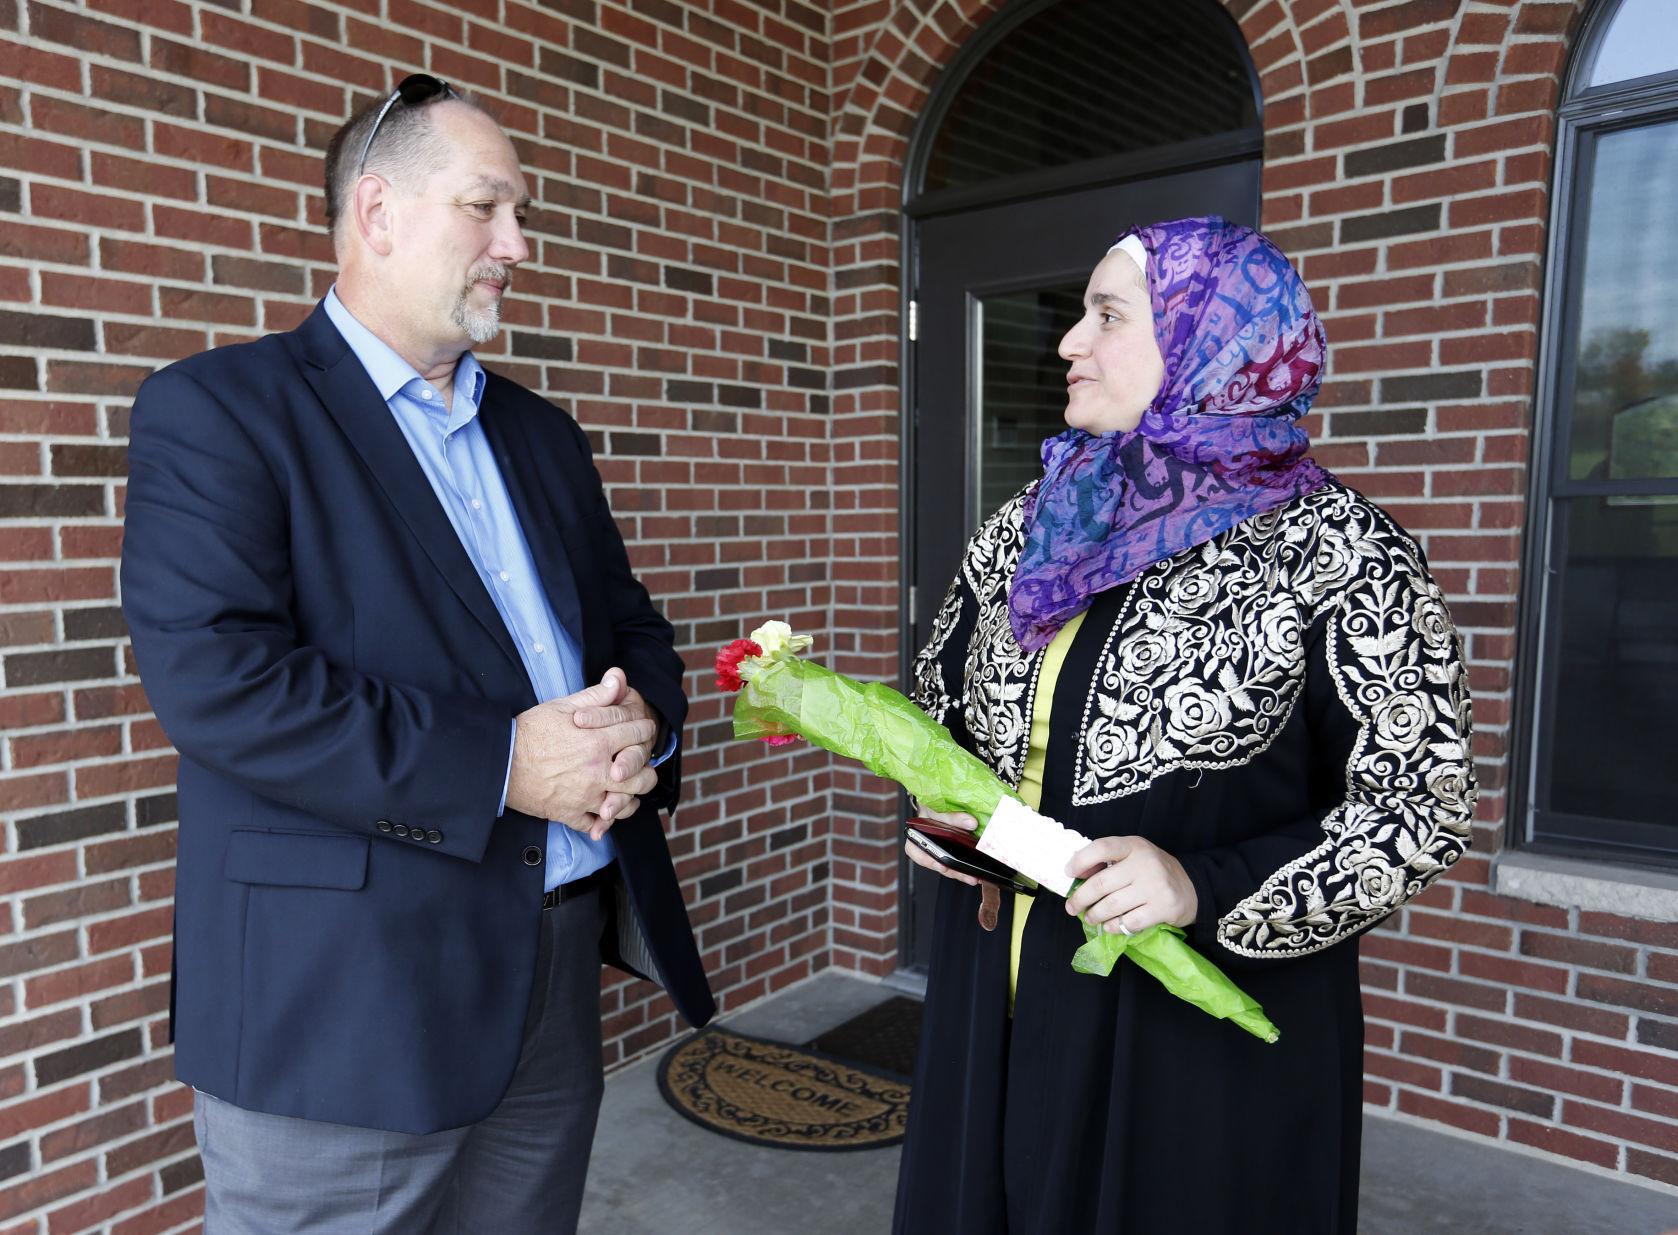 Local congregations rally around graffiti-marred mosque